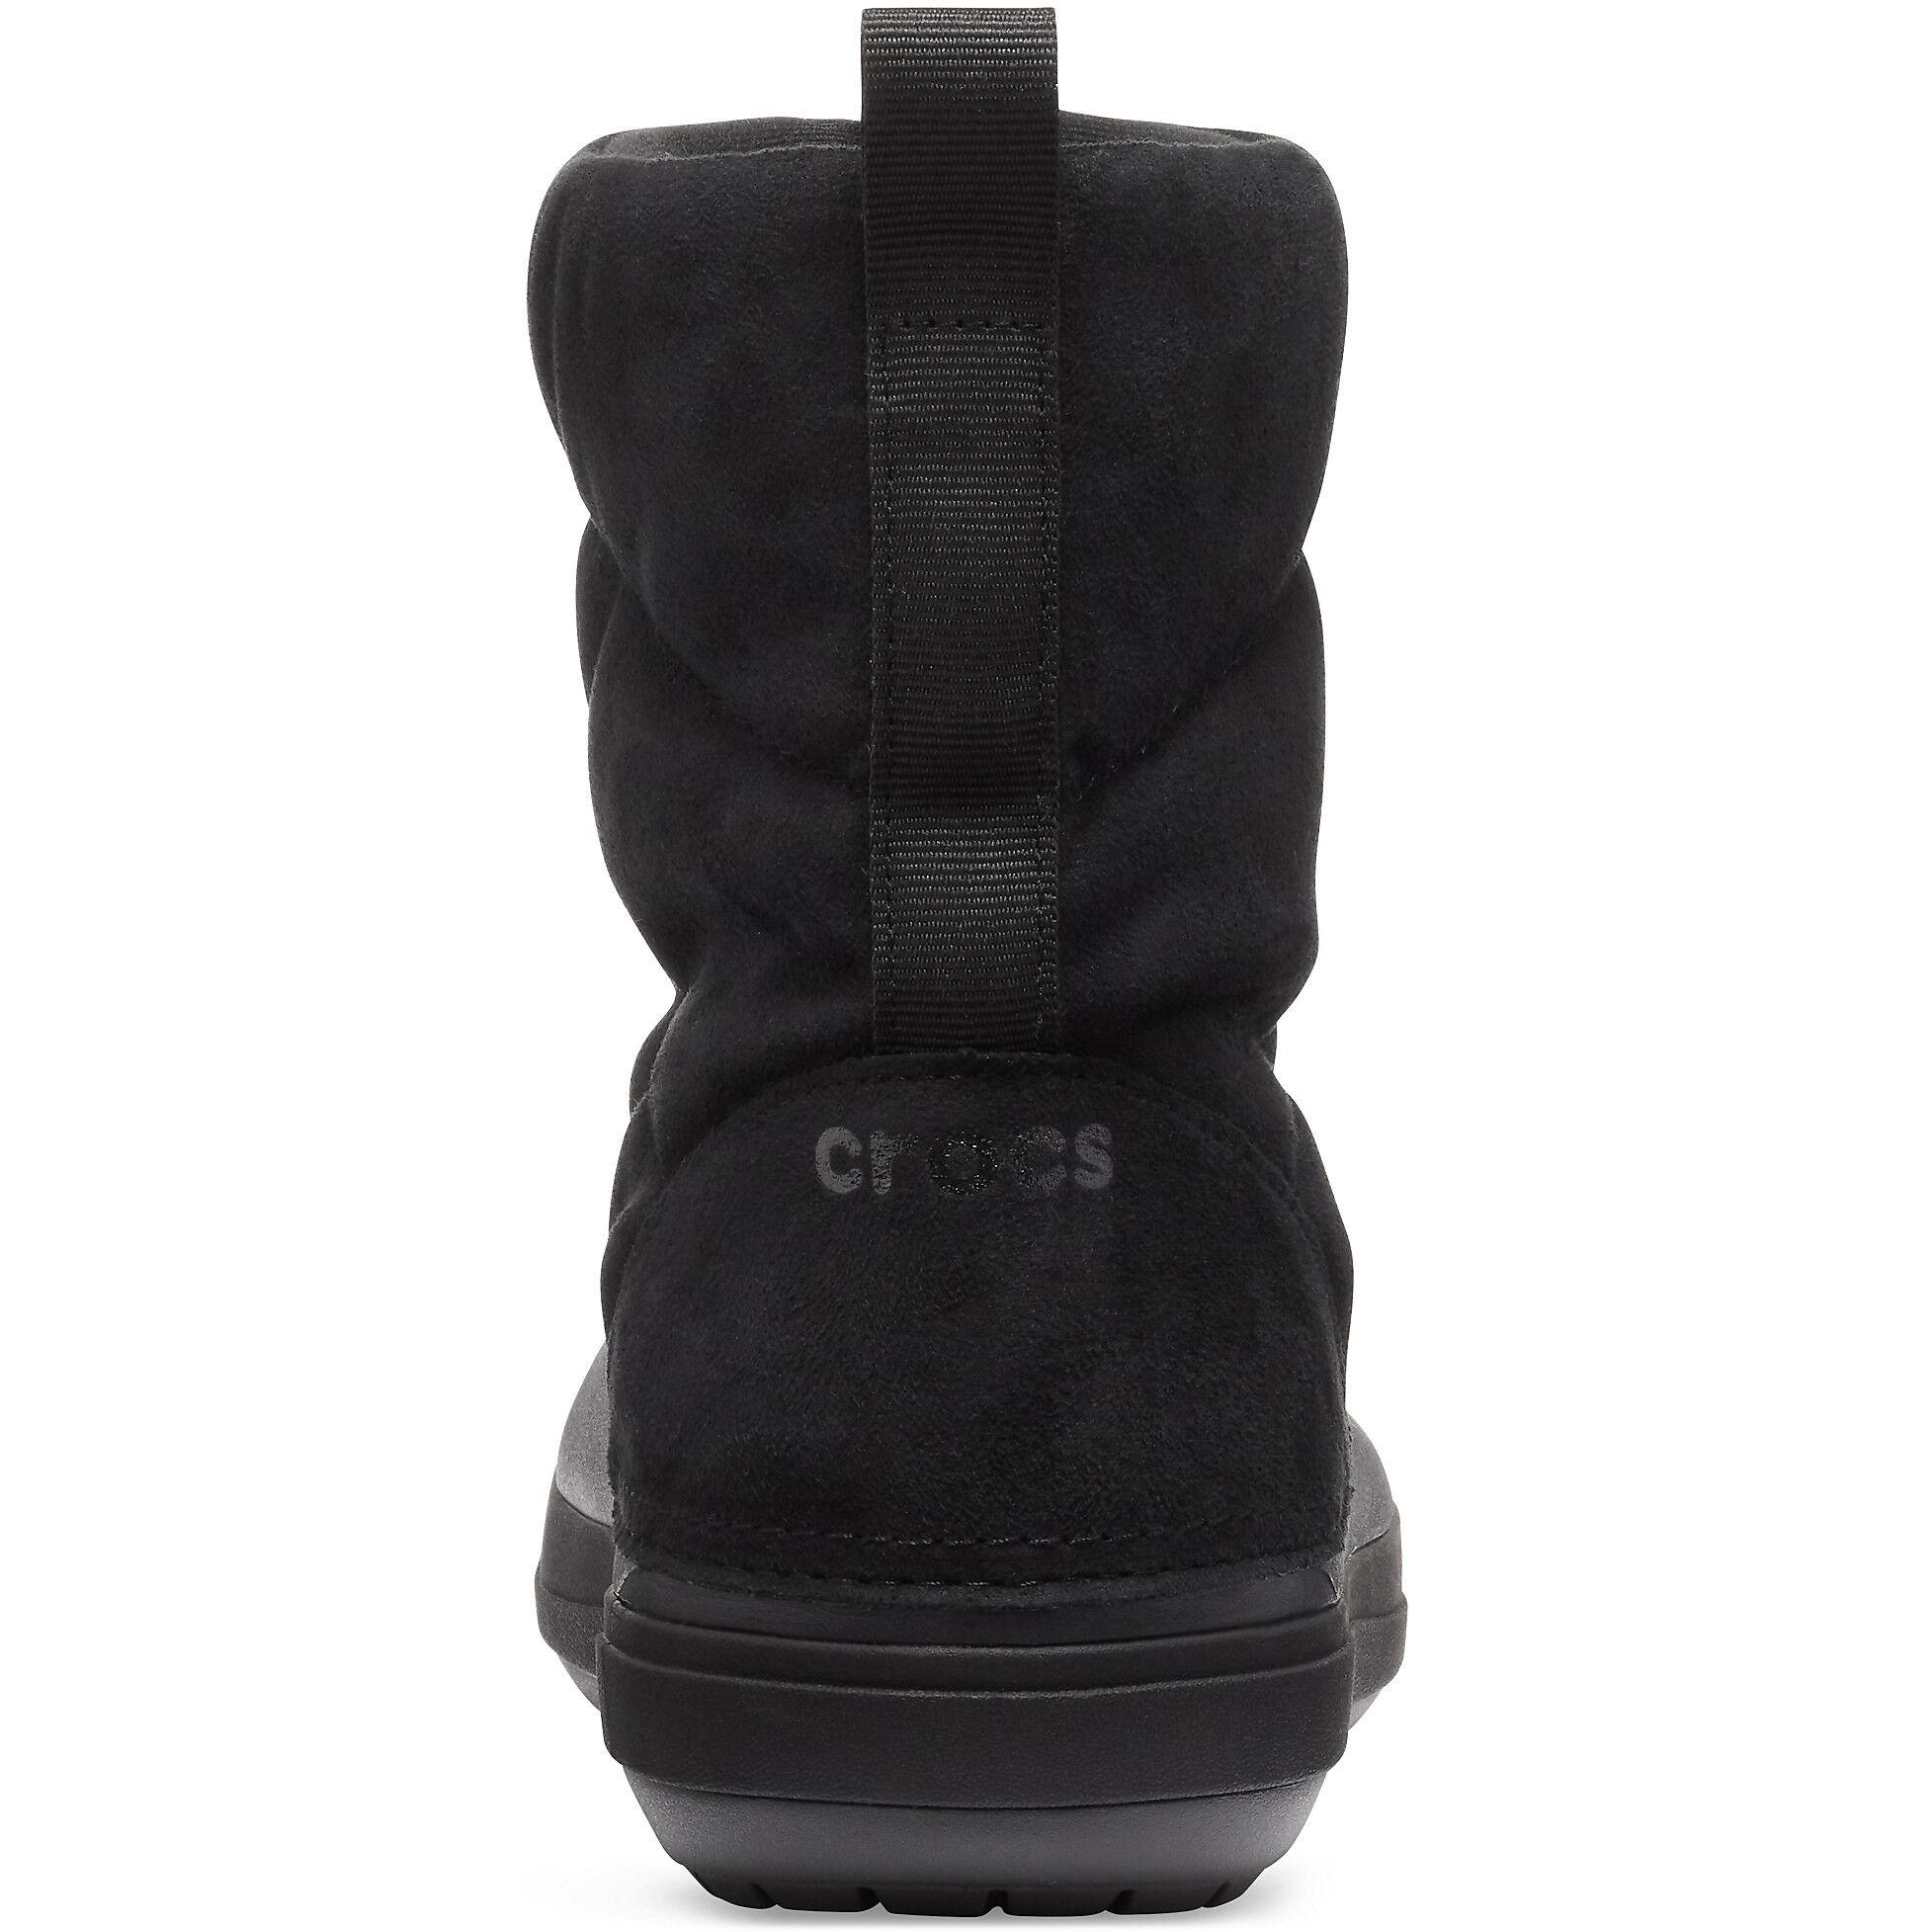 Puff Crocband Damen Black Stiefel Crocs DIWE9H2